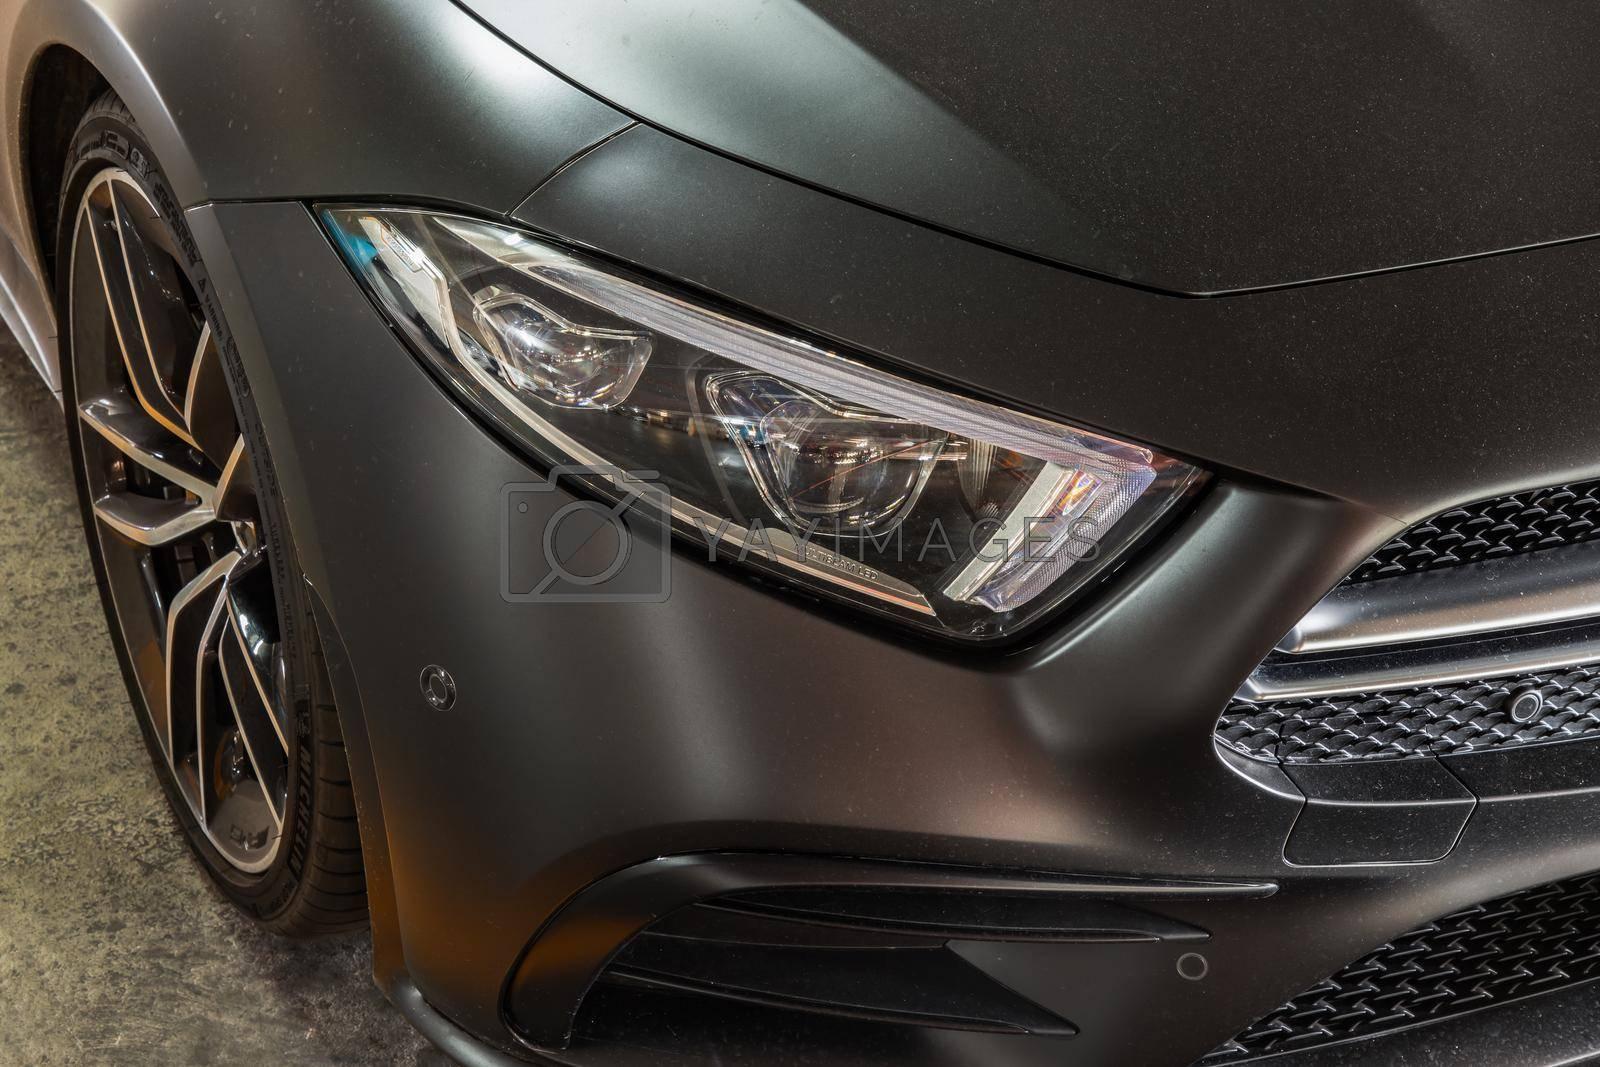 Bangkok, Thailand - 08 Jun 2021 : Close-up of Headlights, Wheel, and Rim of Matte black mercedes sports car. Selective focus.